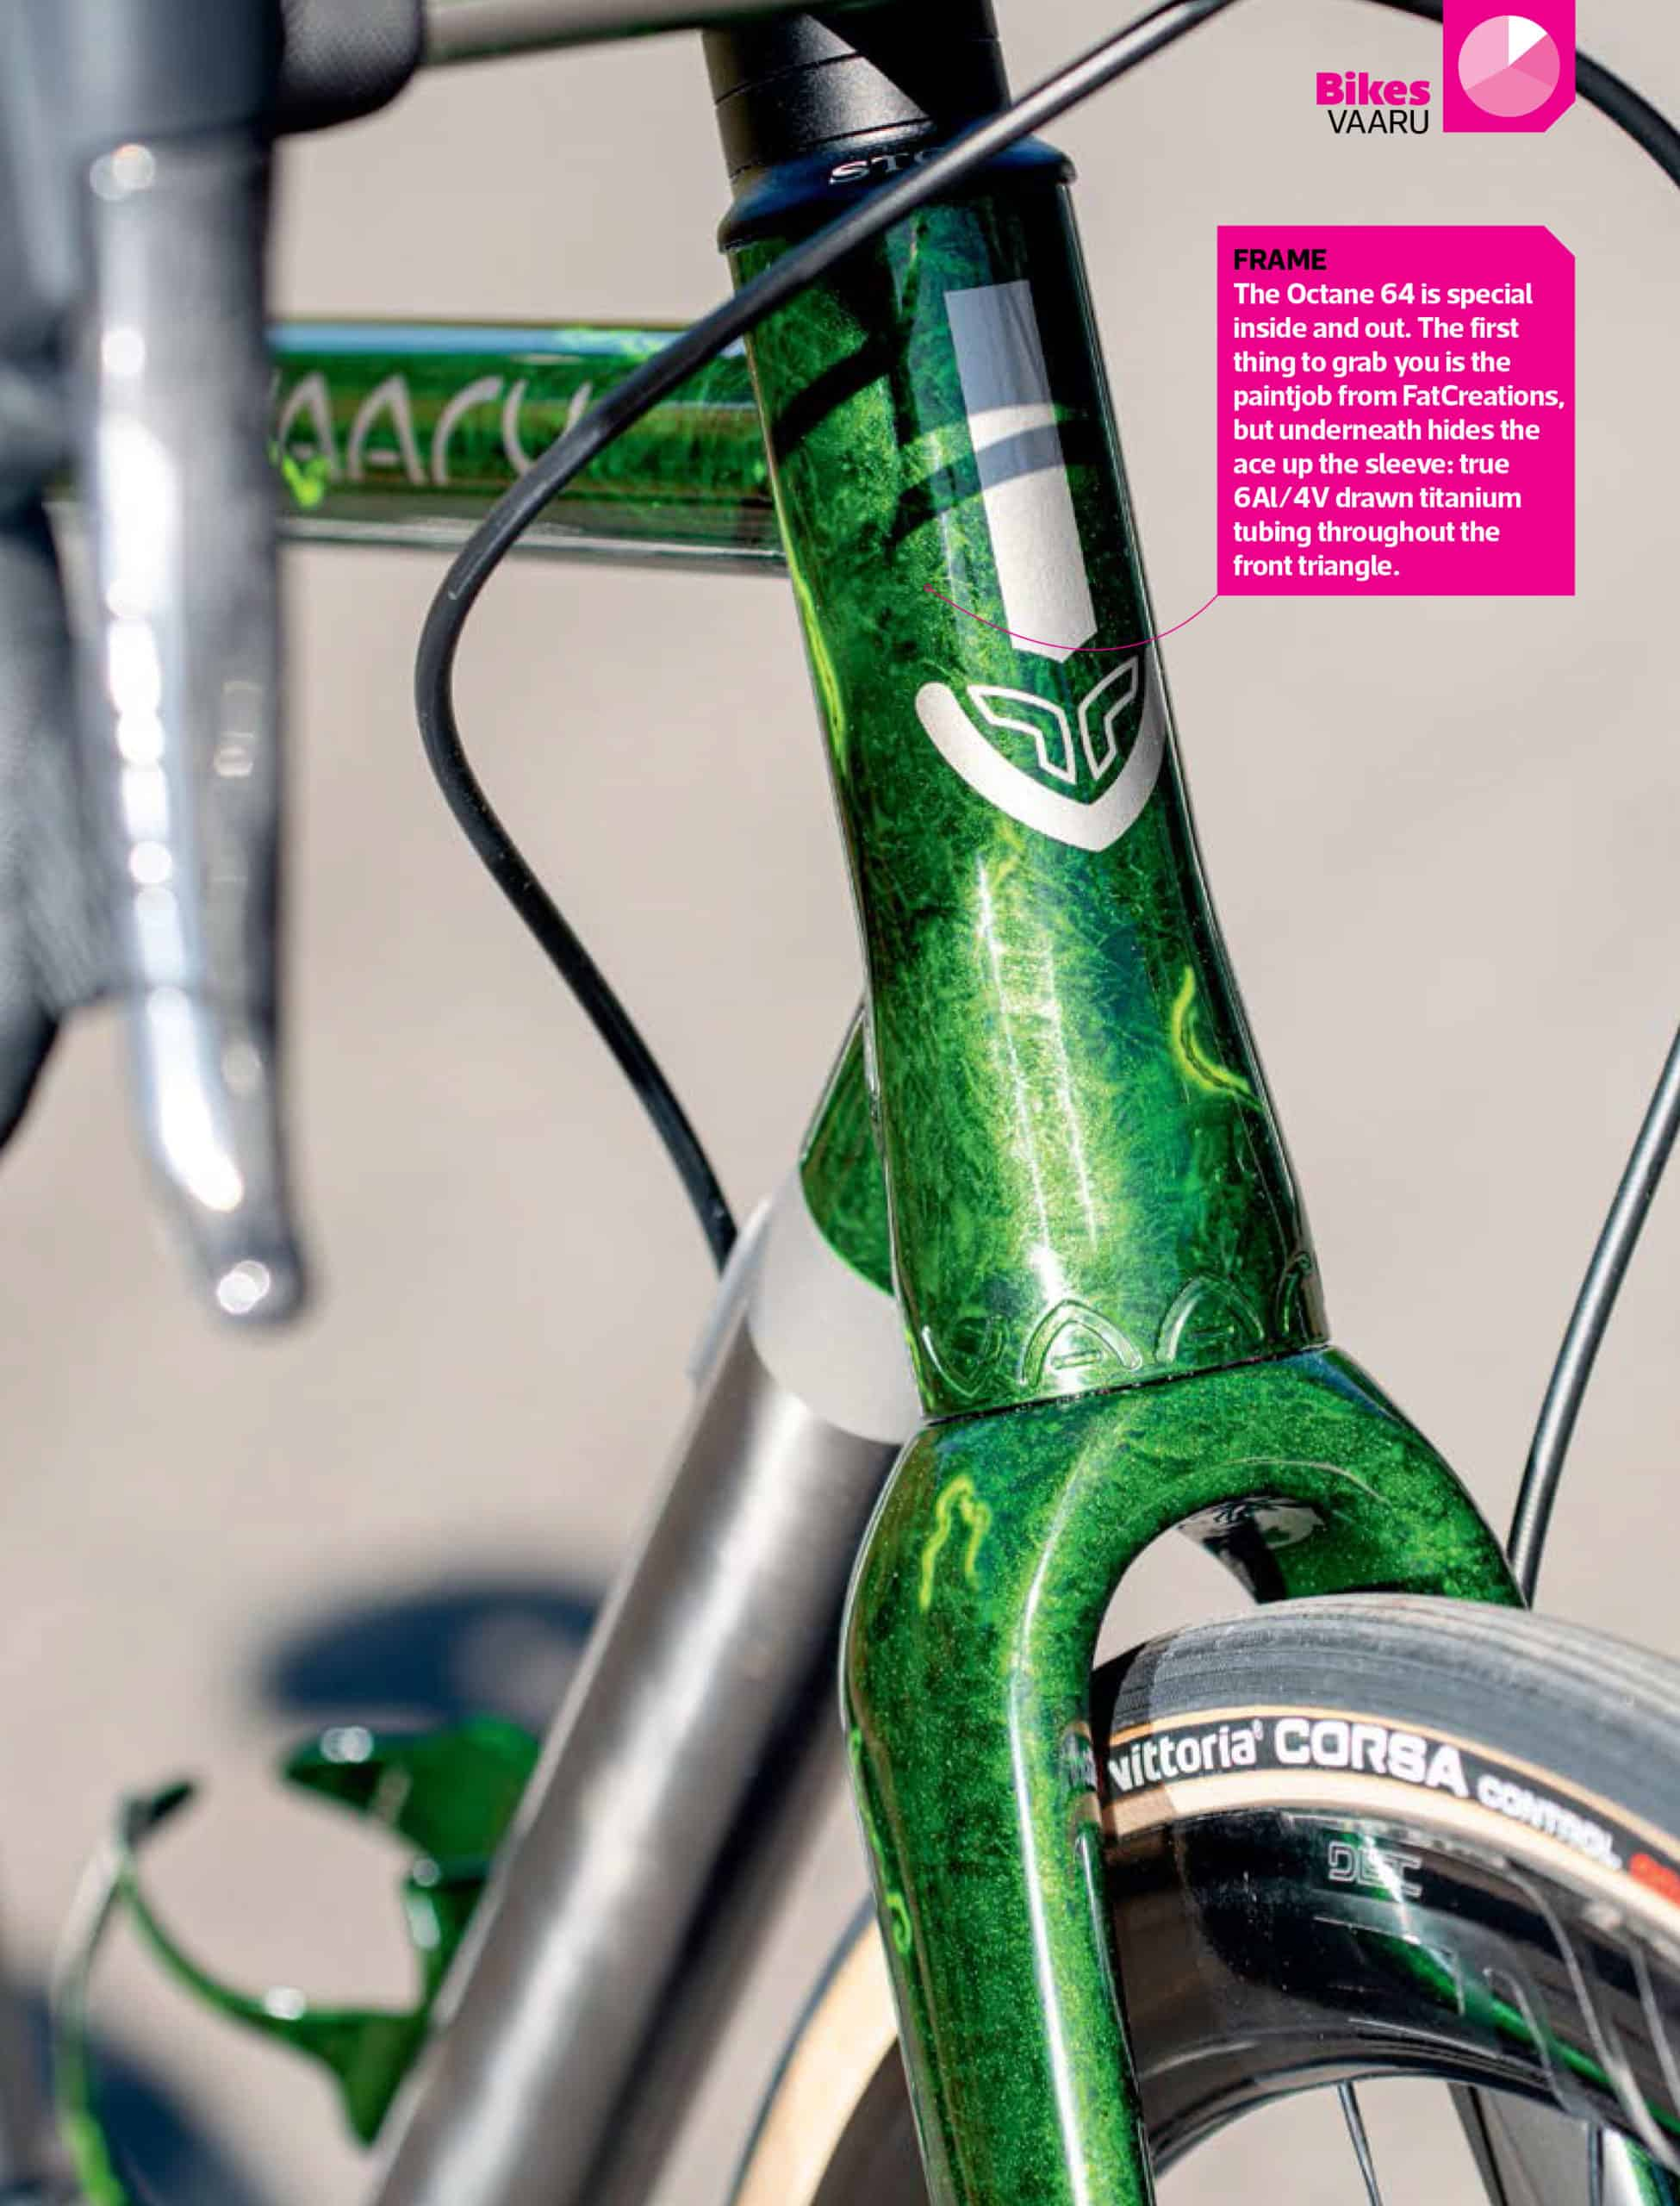 Cycling-Weekly-Dec-2019-Vaaru-Octane-64-Disc-Review-p1b